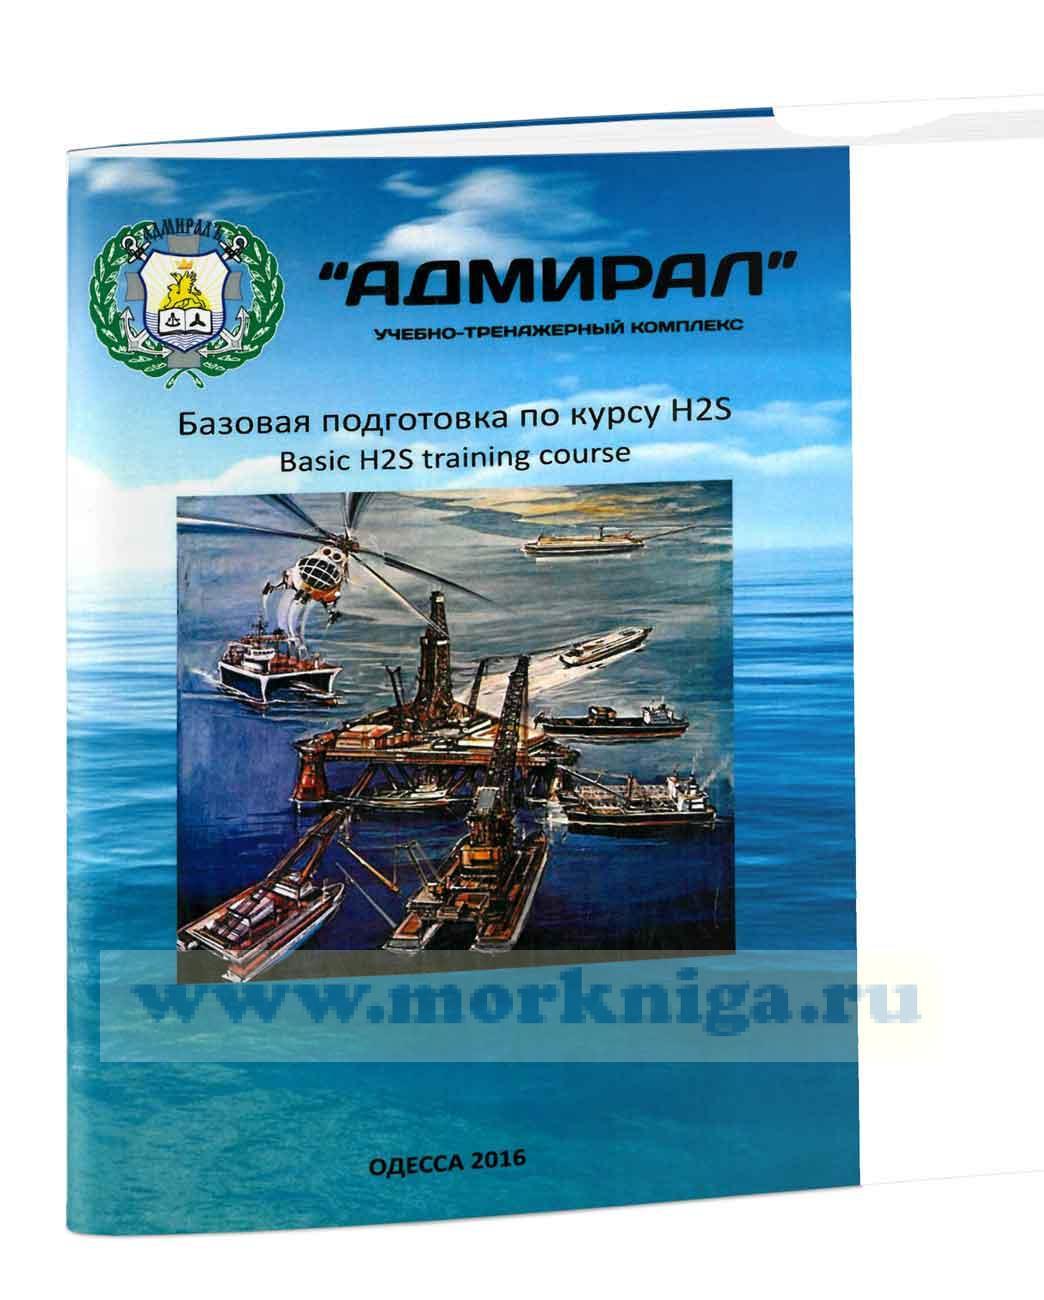 Базовая подготовка по курсу H2S Basic H2S training course